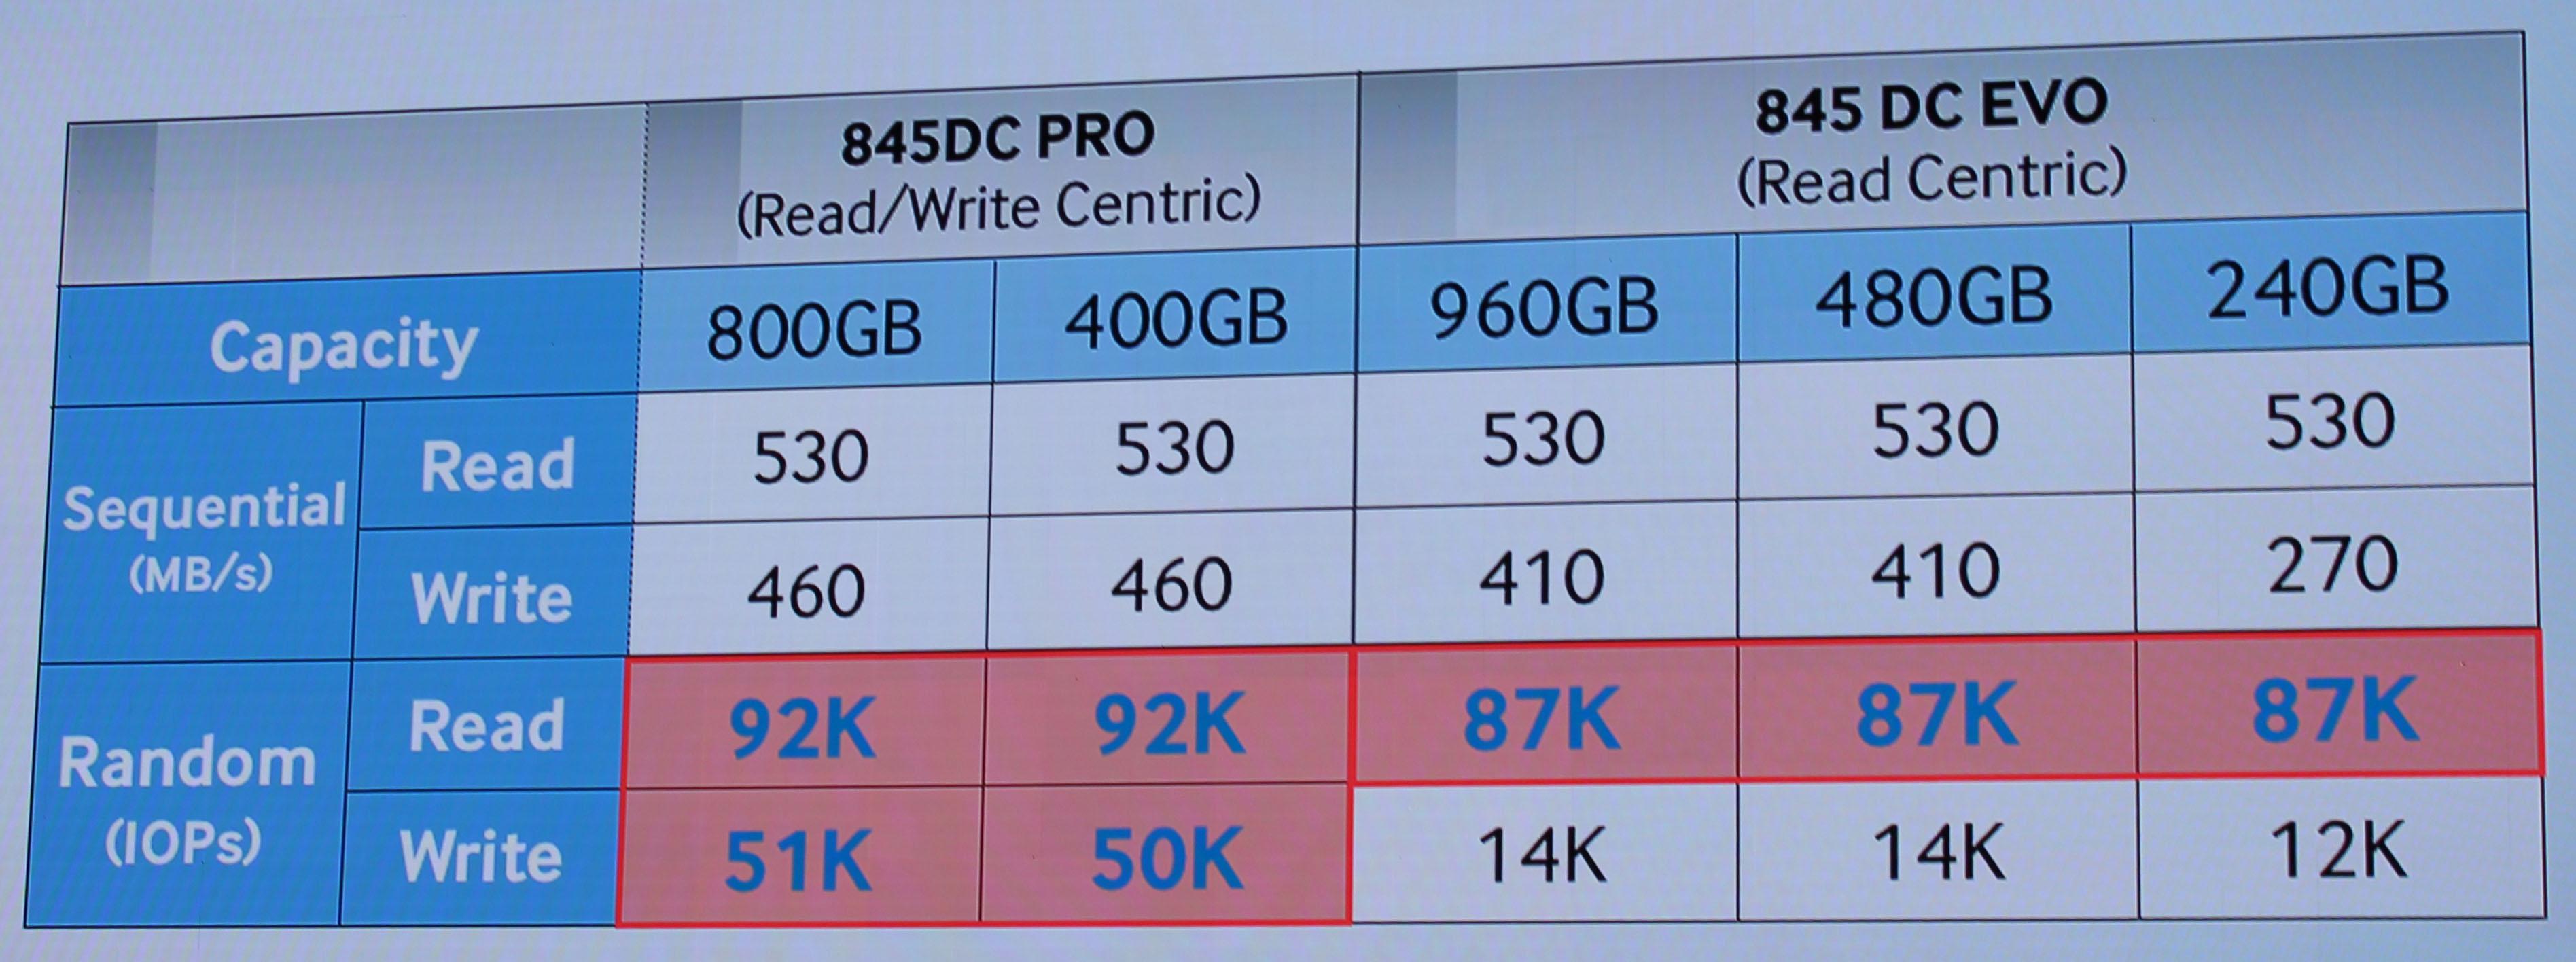 845DC%20Pro%20specs.jpg